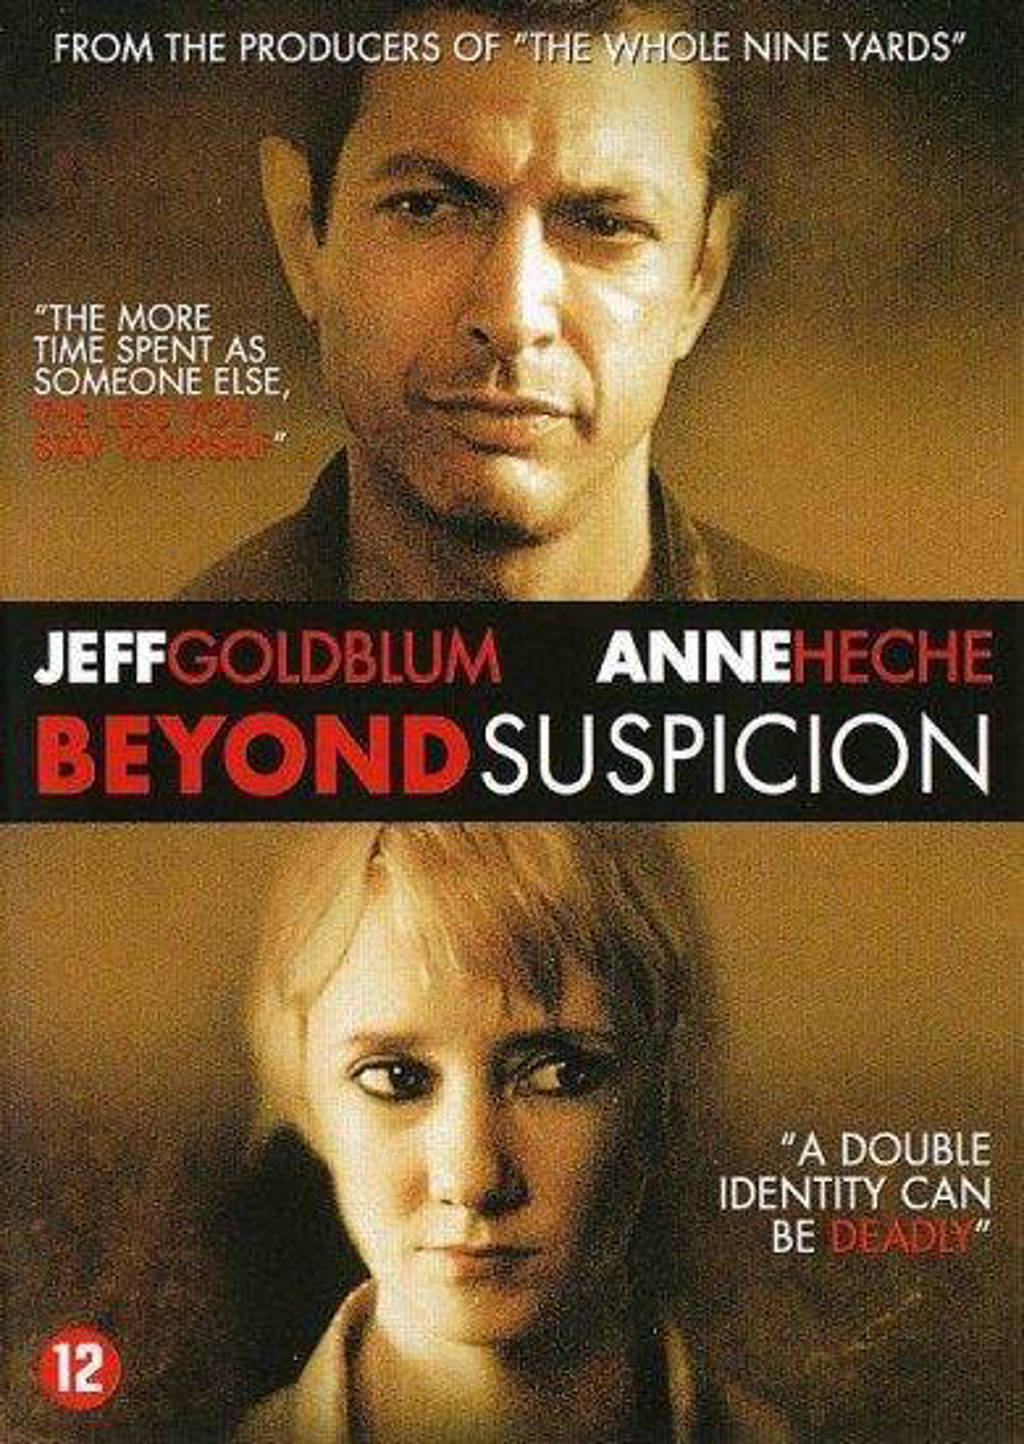 Beyond suspicion (DVD)